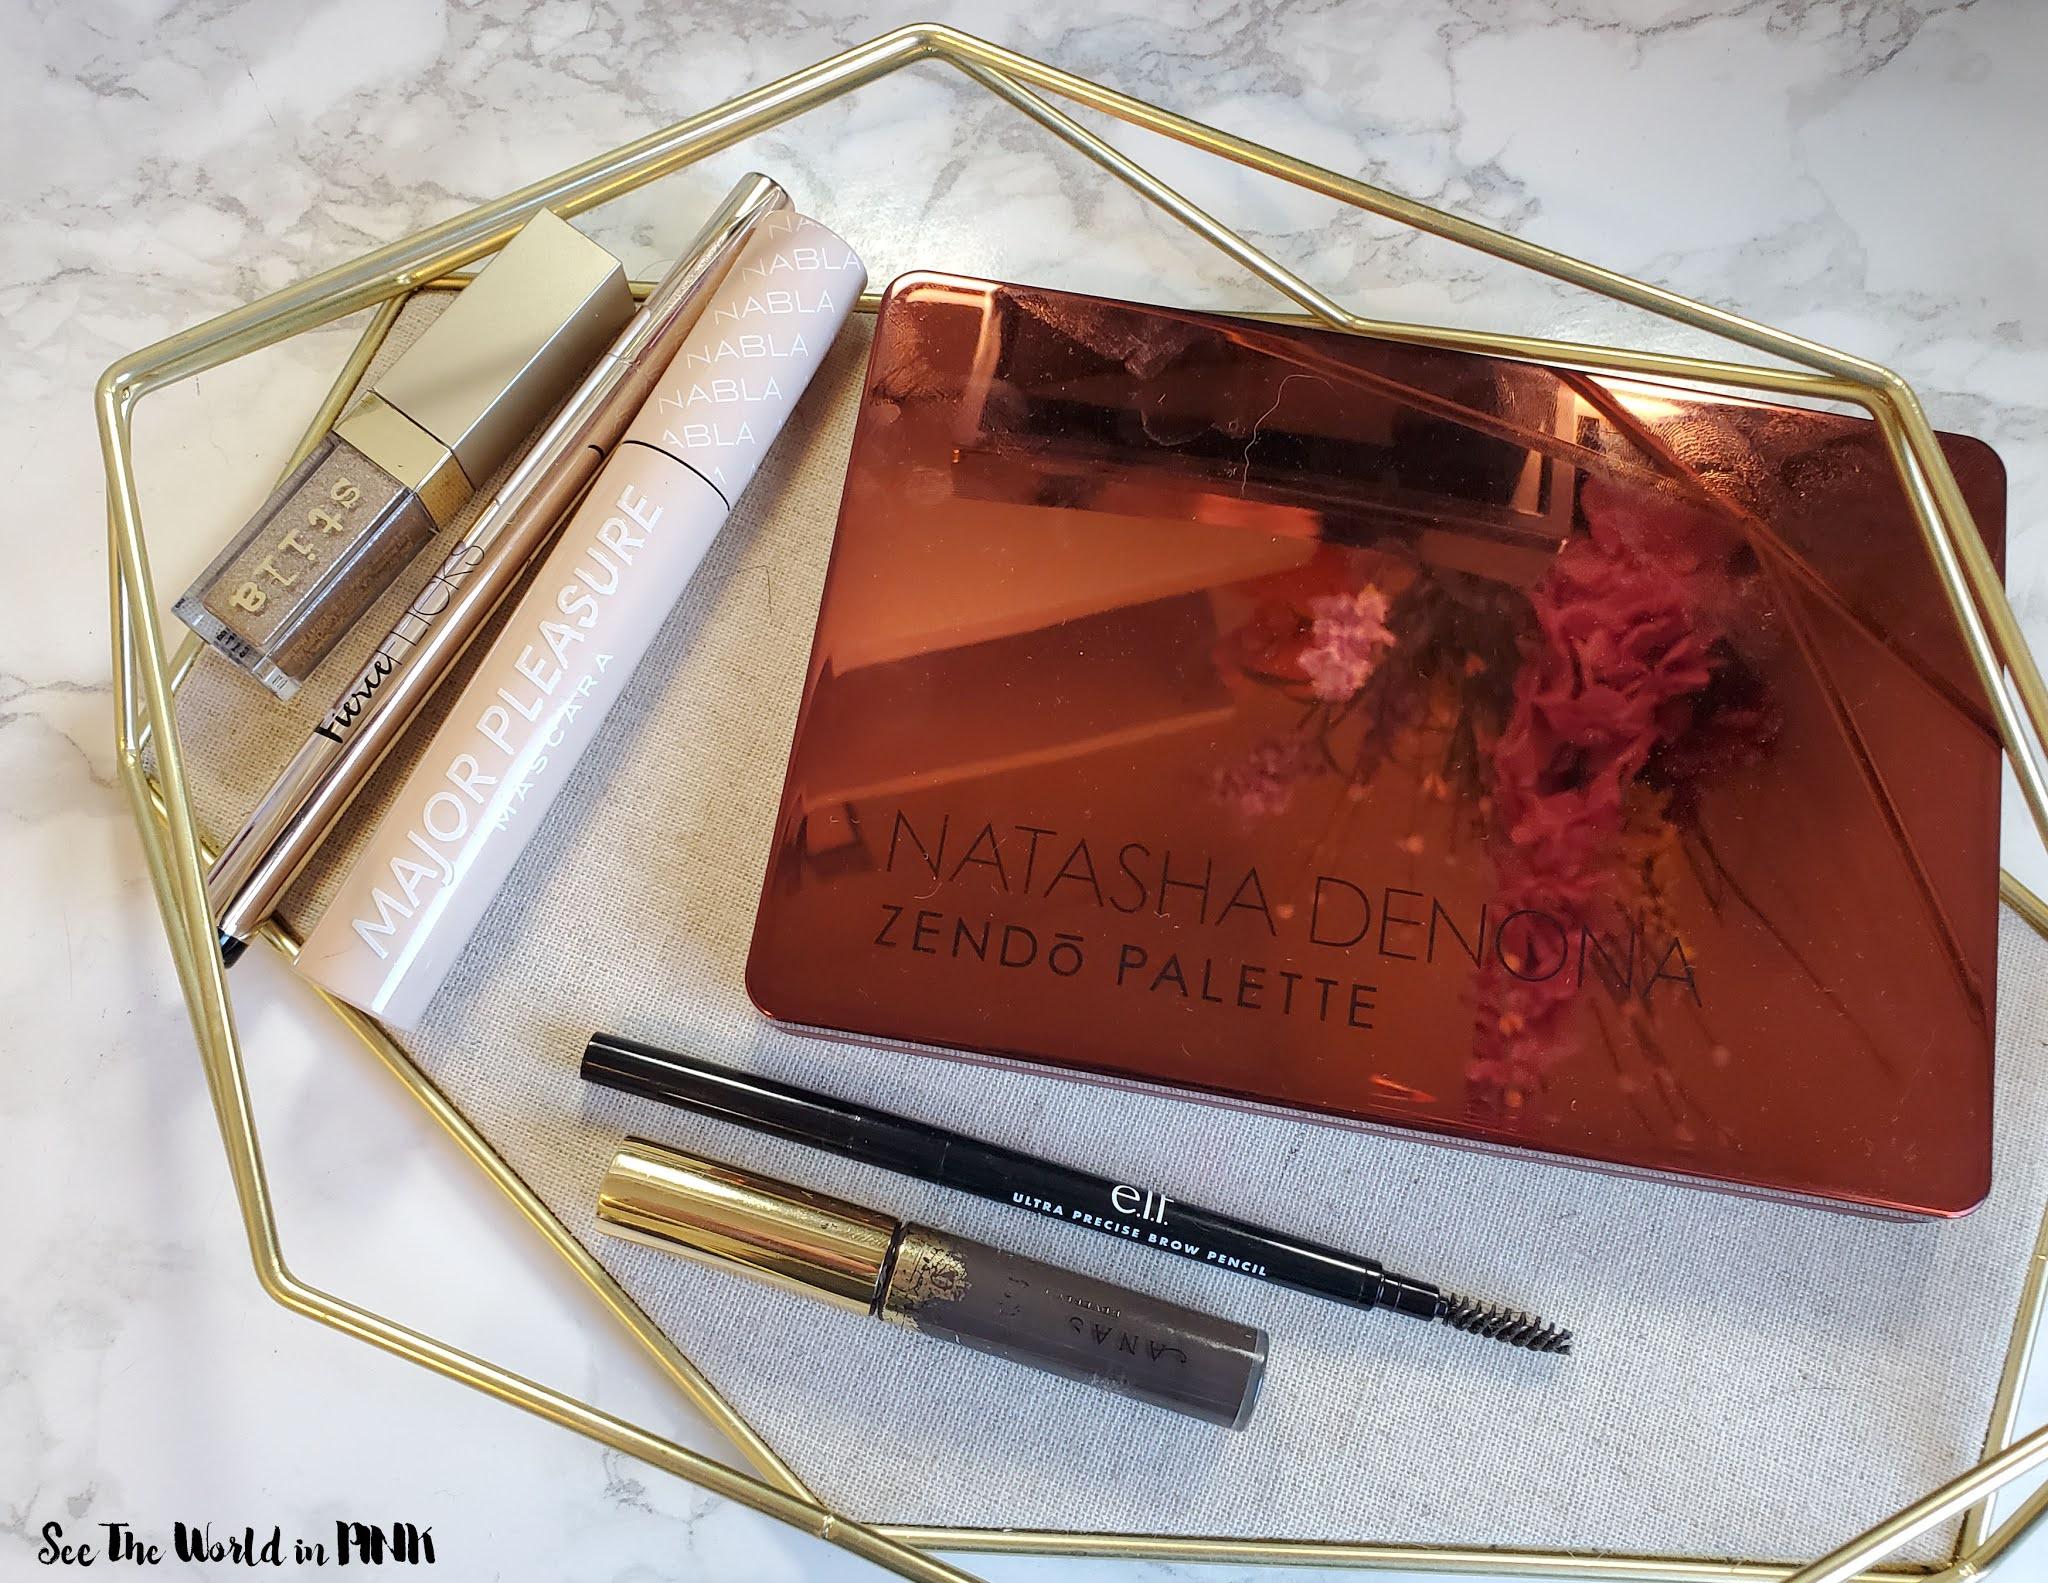 June Shop My Stash ~ Summer Bright Red Lipstick Look featuring Cheekbone Beauty Sustain Lipliner and Lipstick